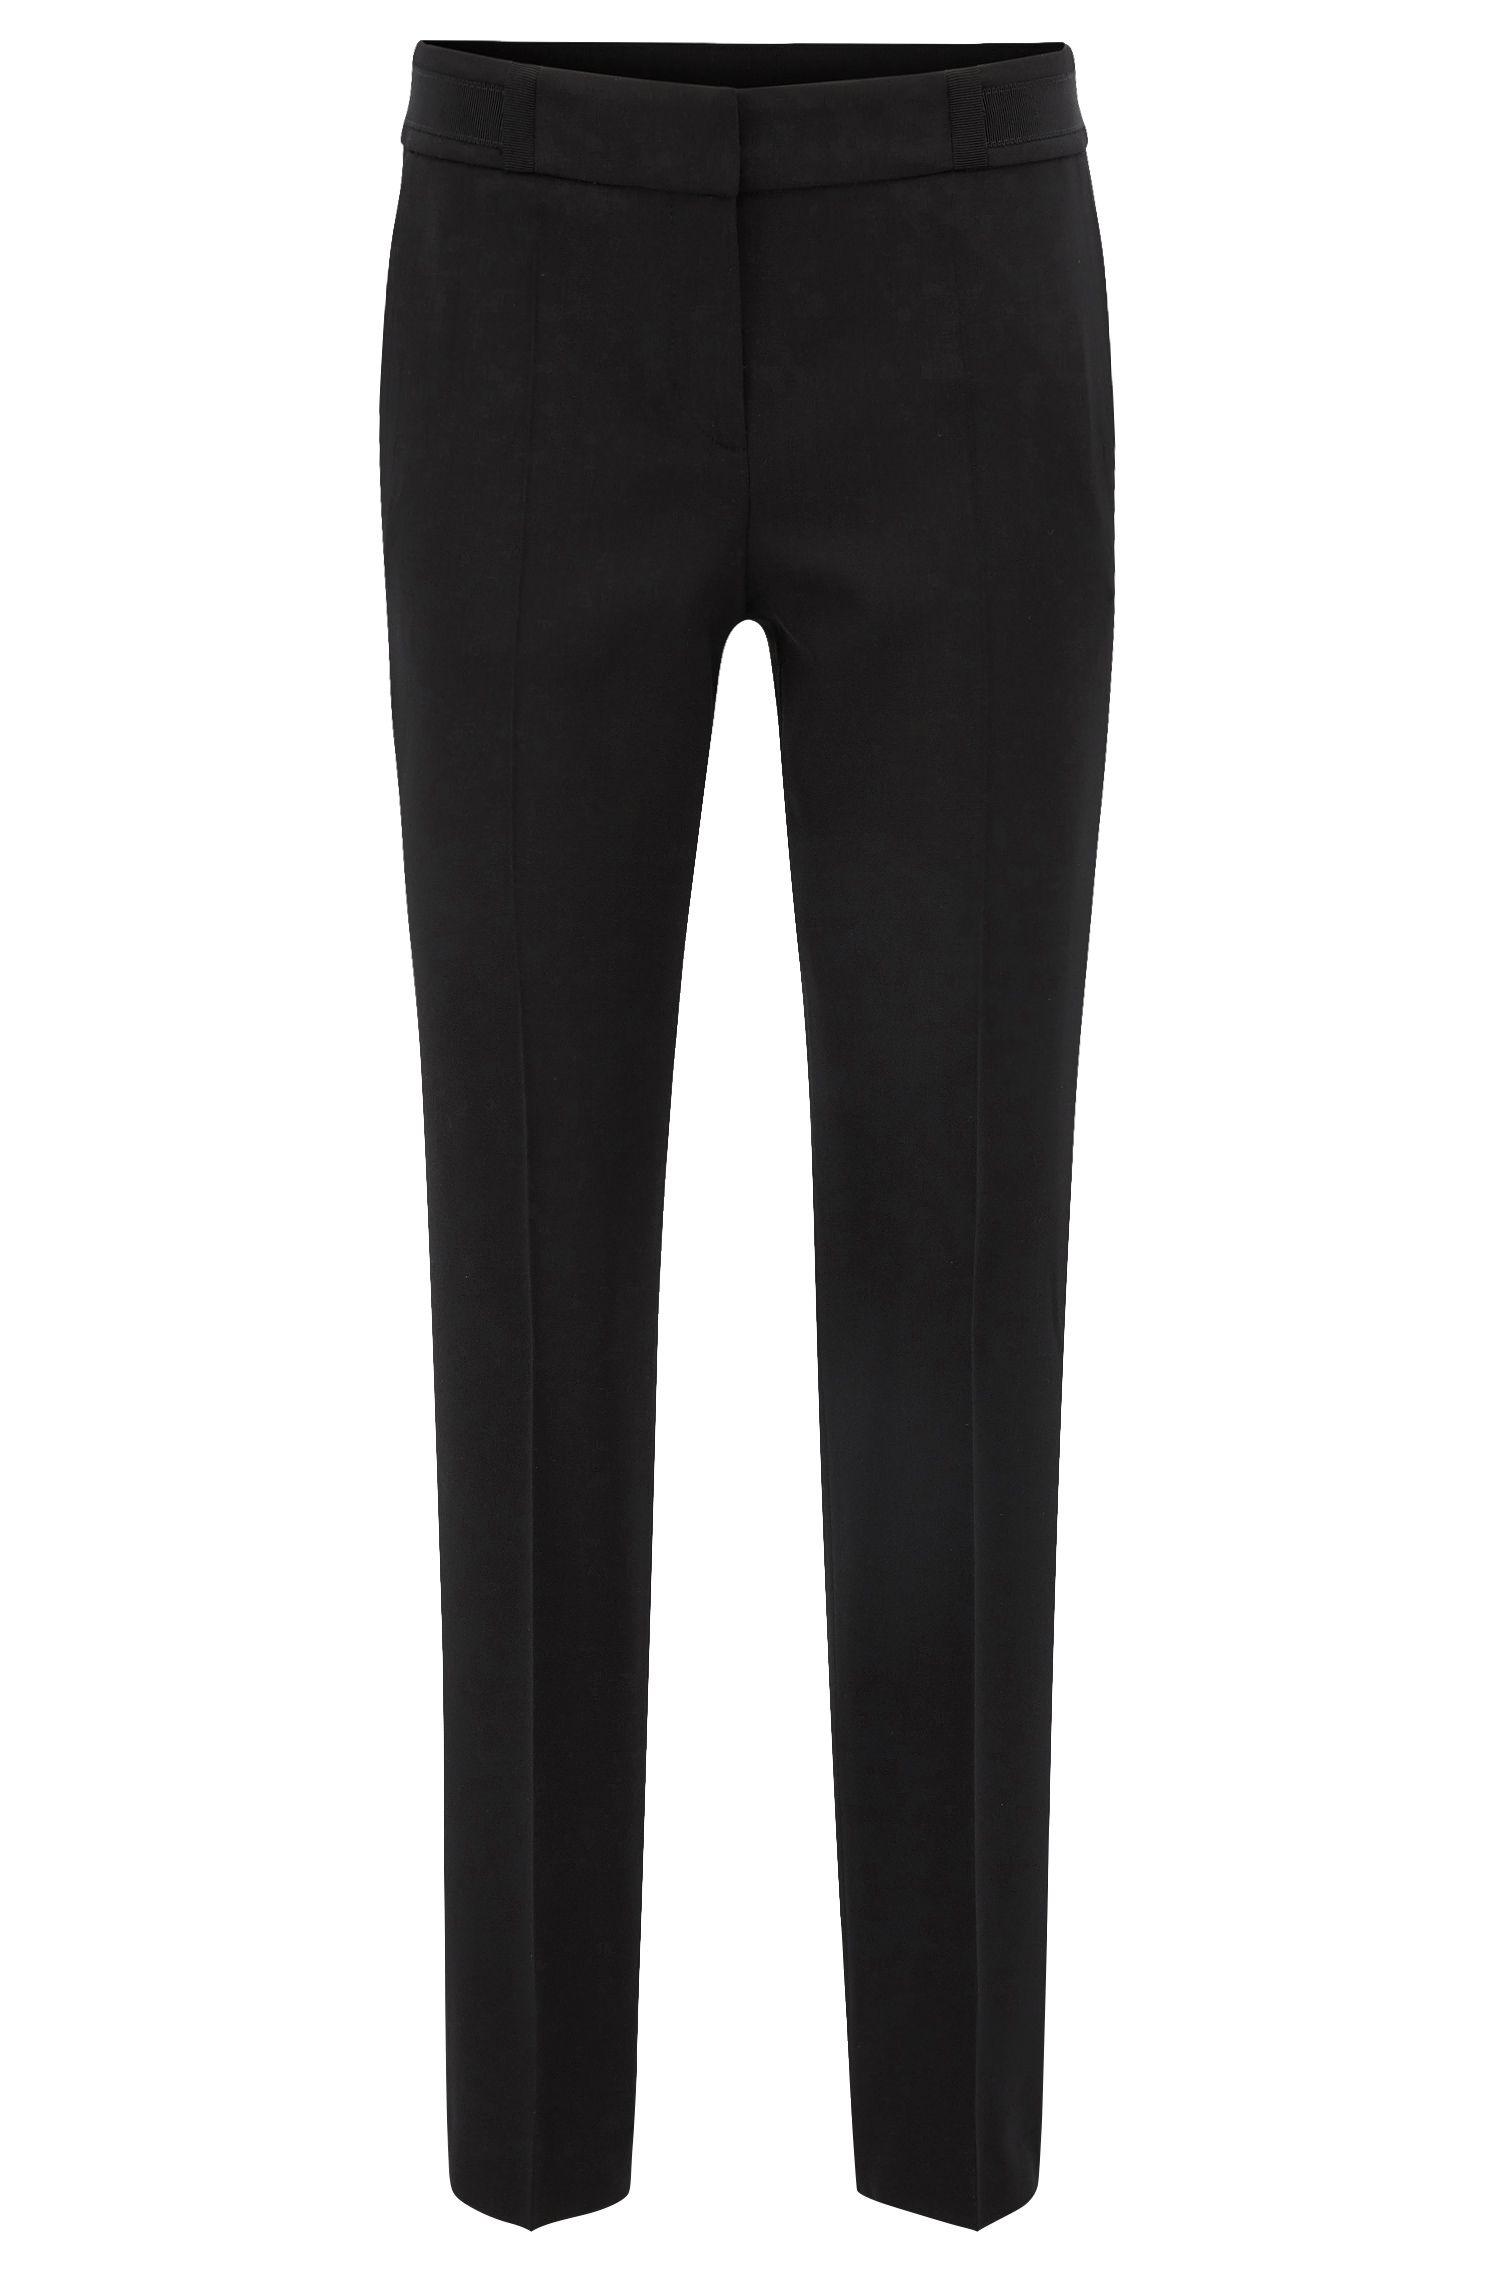 Pantaloni regular fit in twill di lana vergine elasticizzata